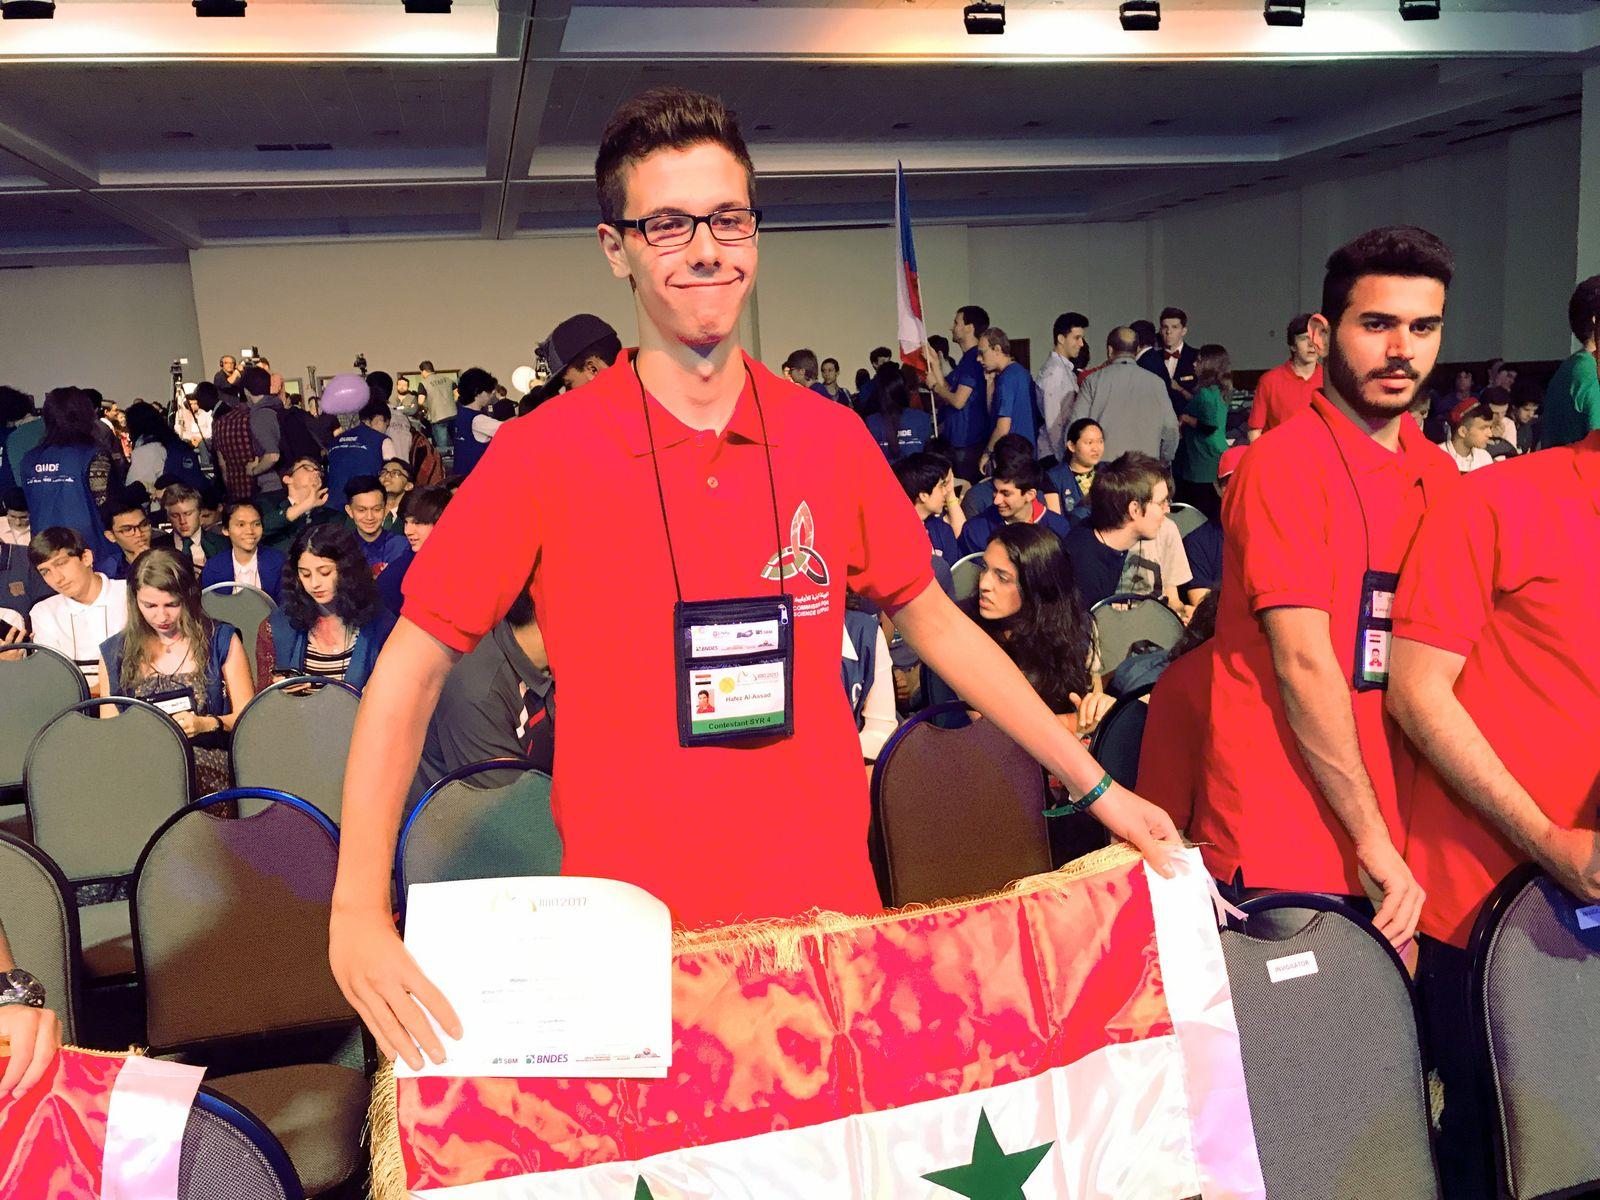 Mathematik-Olympiade - Hafez al-Assad